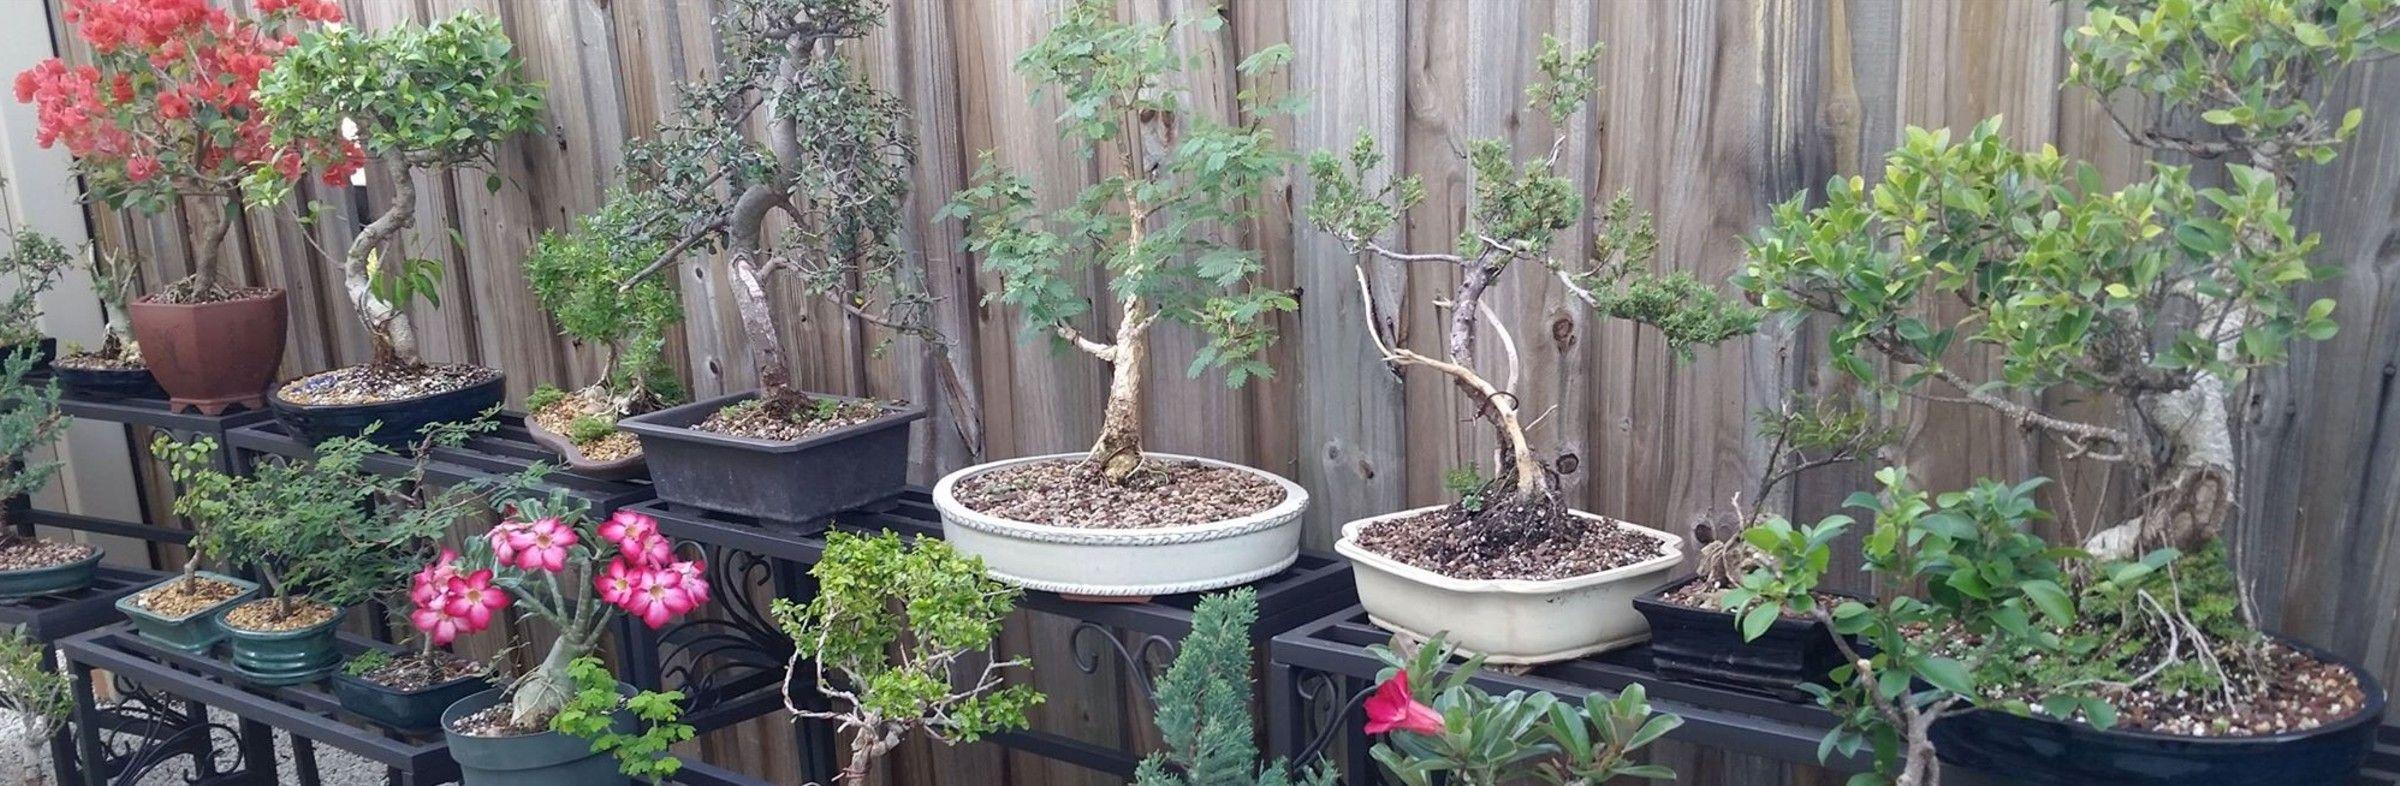 bonsai stabla